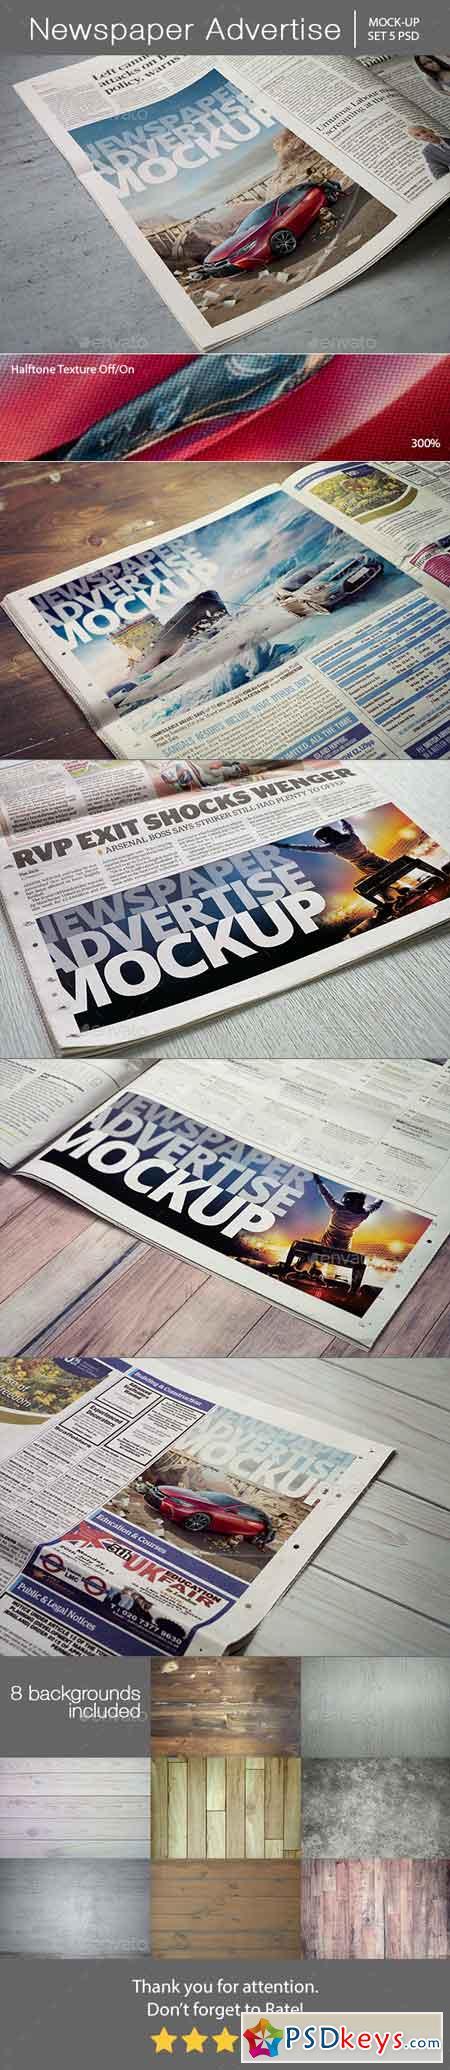 Newspaper Advertise Mockup 13345143